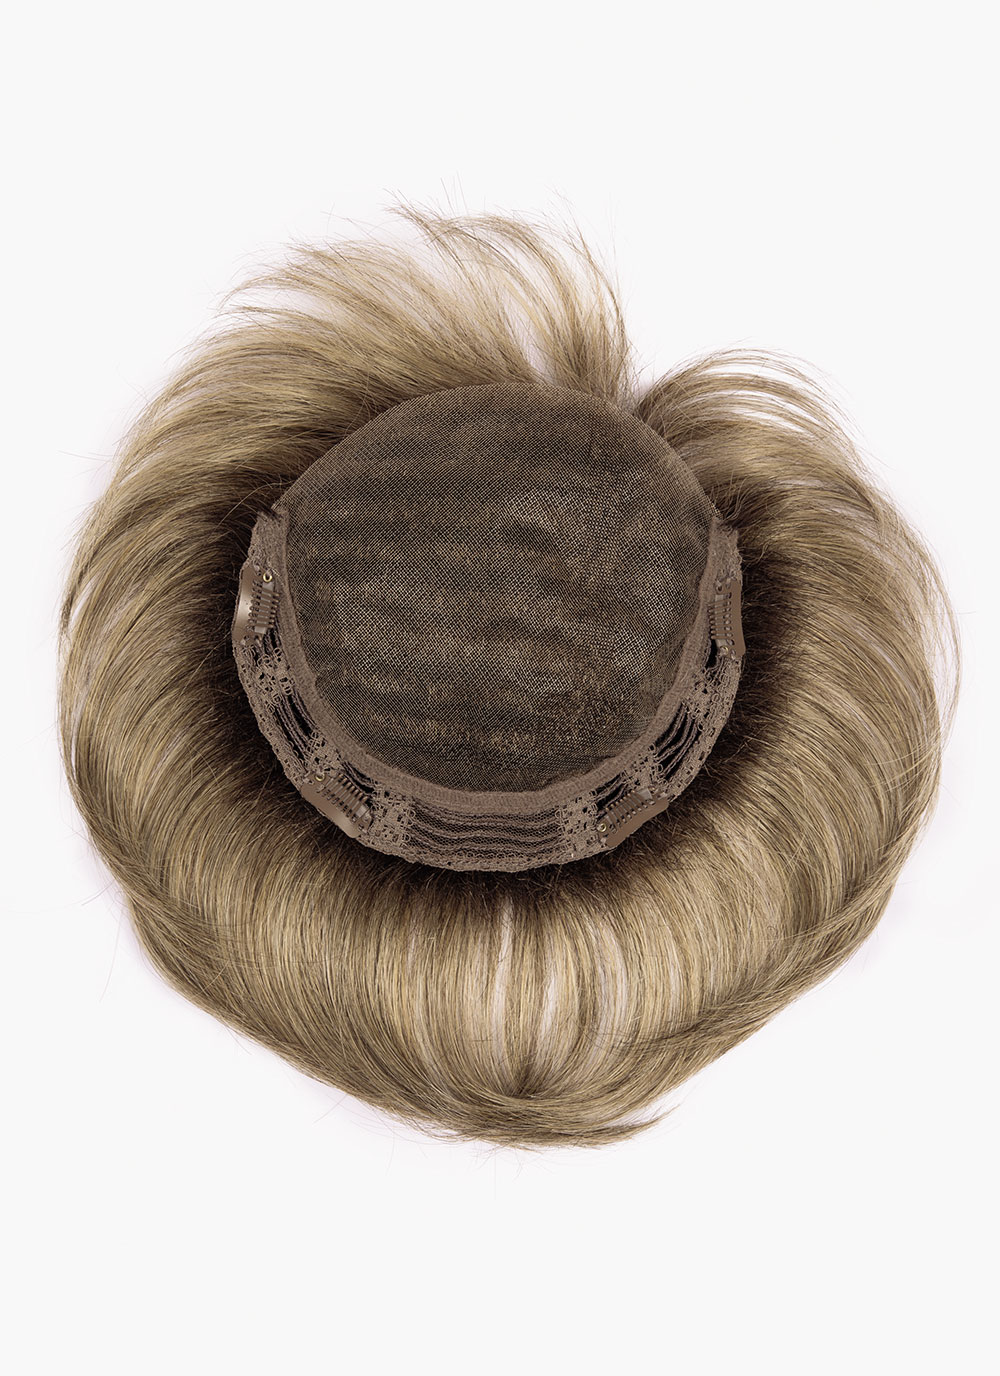 "Lace Top by Ellen Wille   Base Size  17 cm x 16 cm or 6.7""x 6.3""    -  Approximate Hair Length  Fringe: 3.75"" (9.5cm)   Crown: 4.5"" (11.5cm)  Sides: 4.8"" (12cm)"